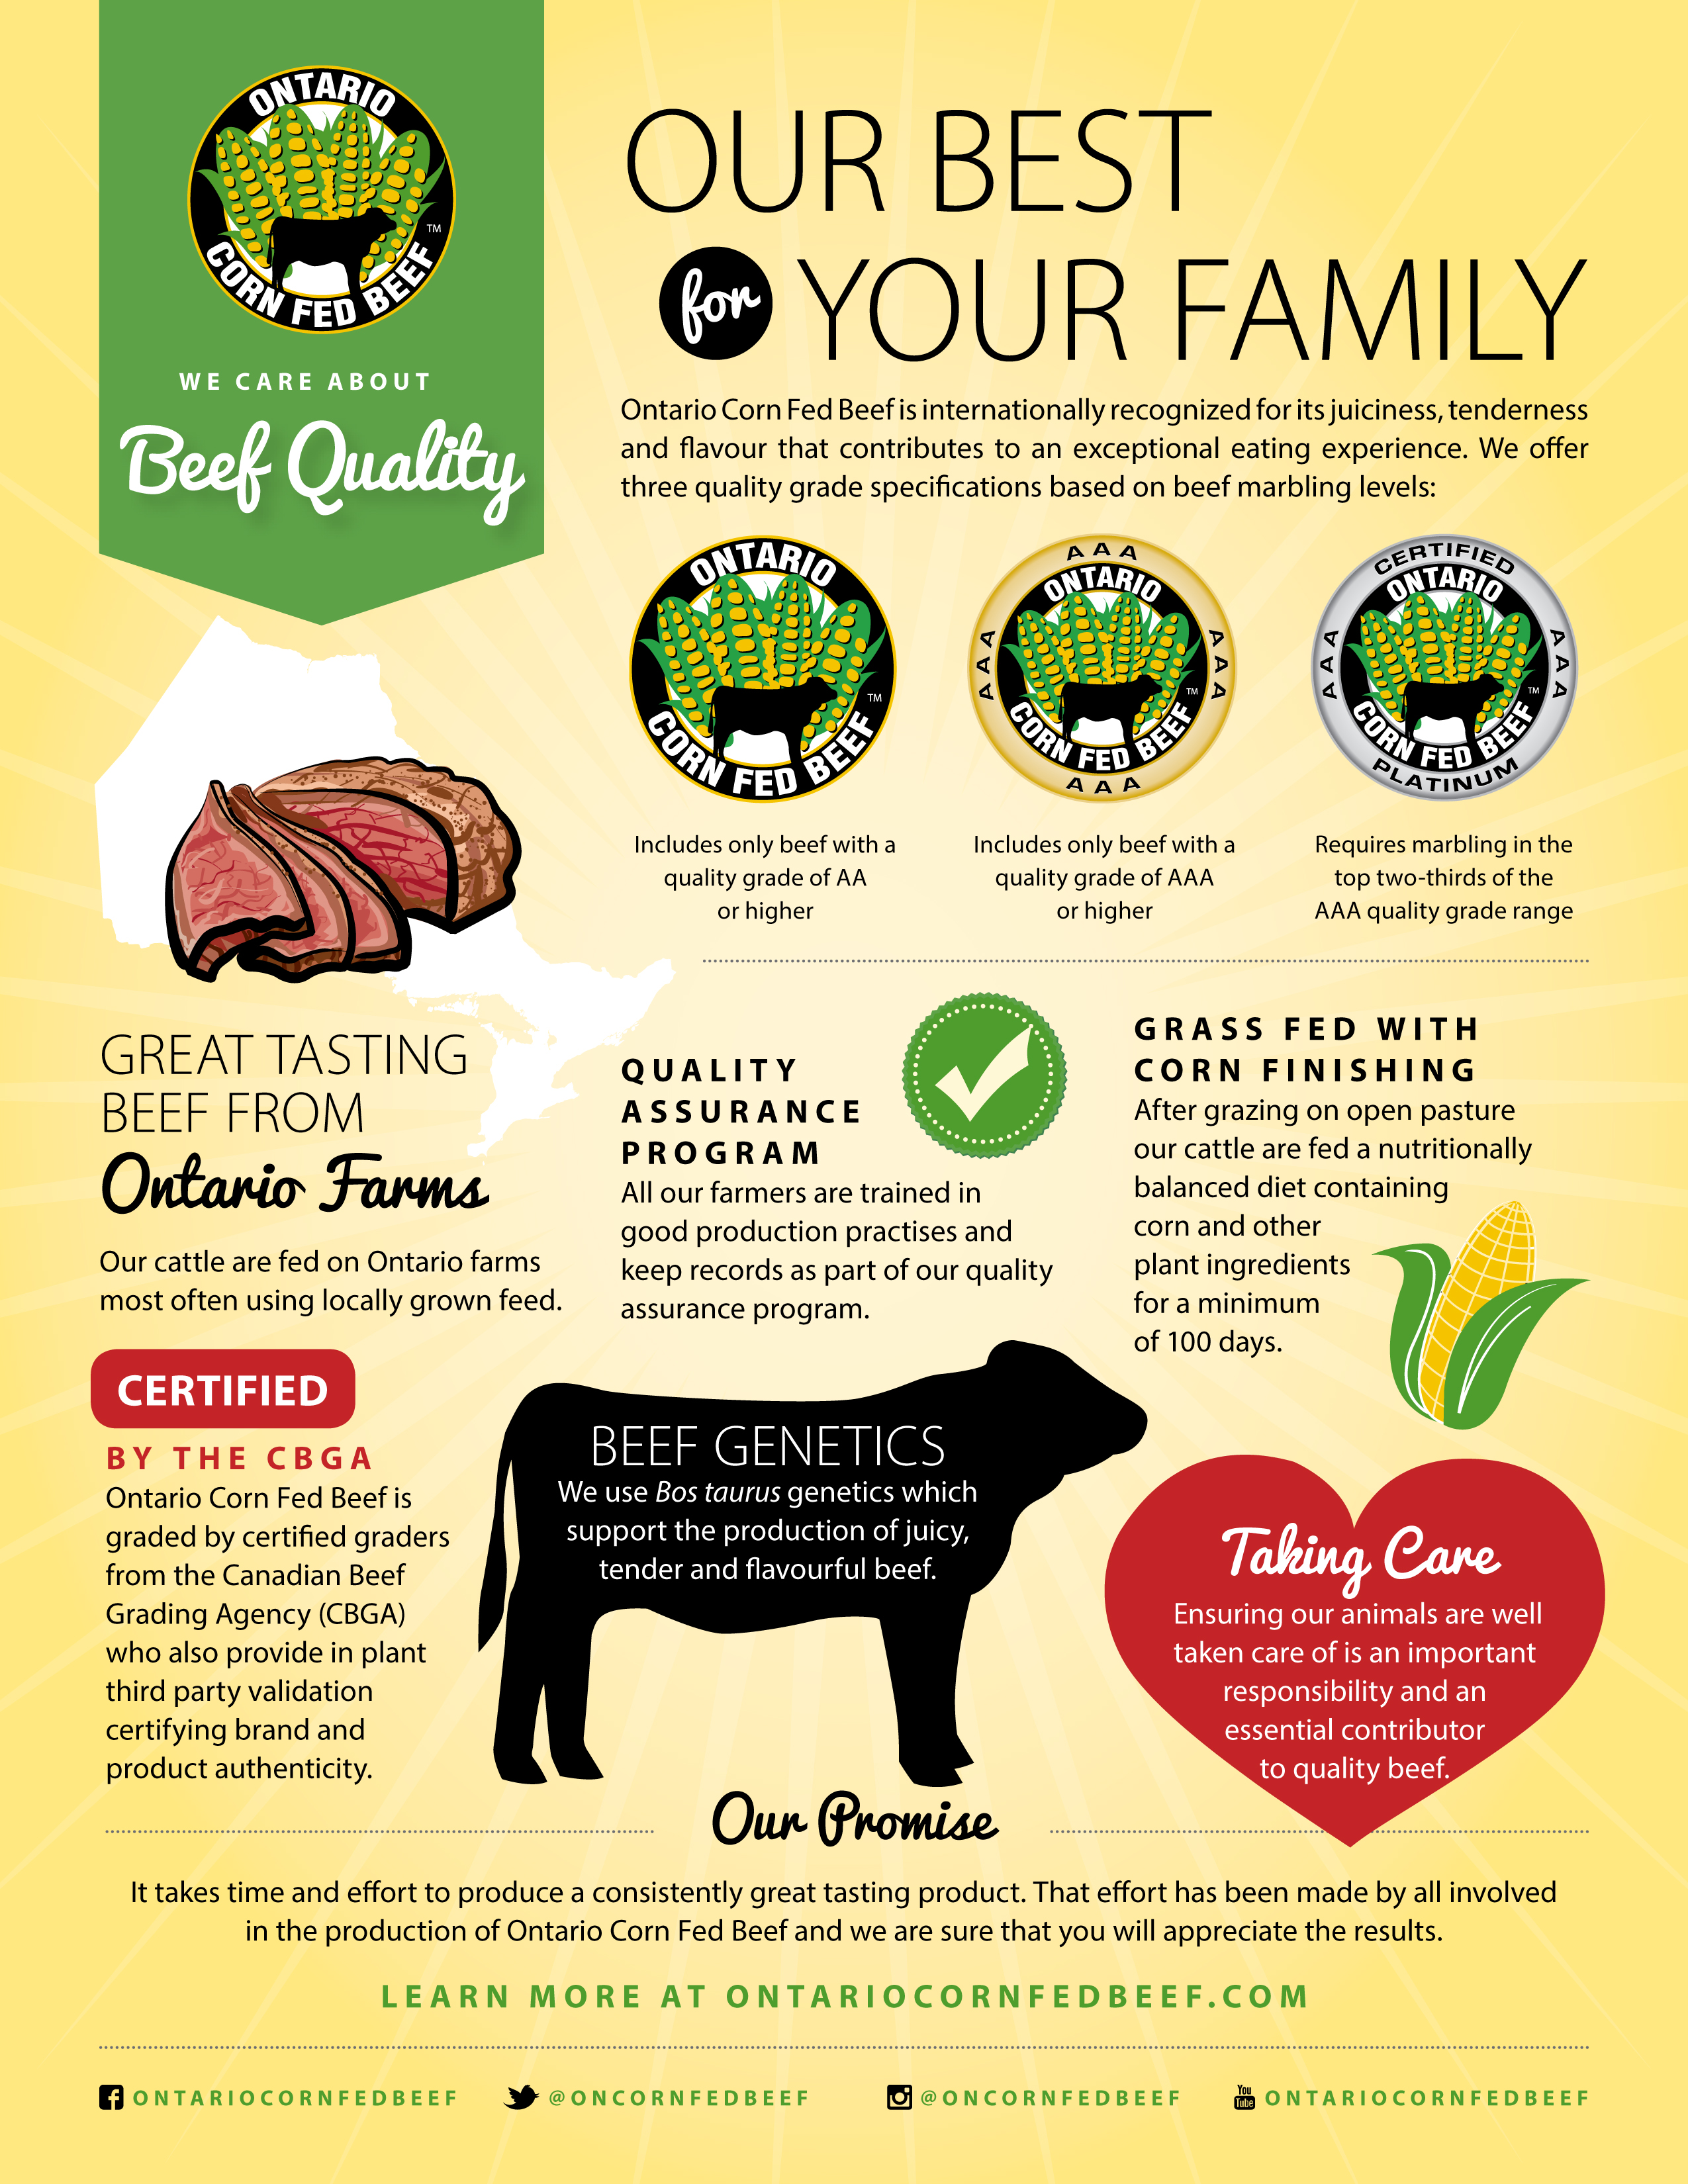 beef-quality-ocfb-web